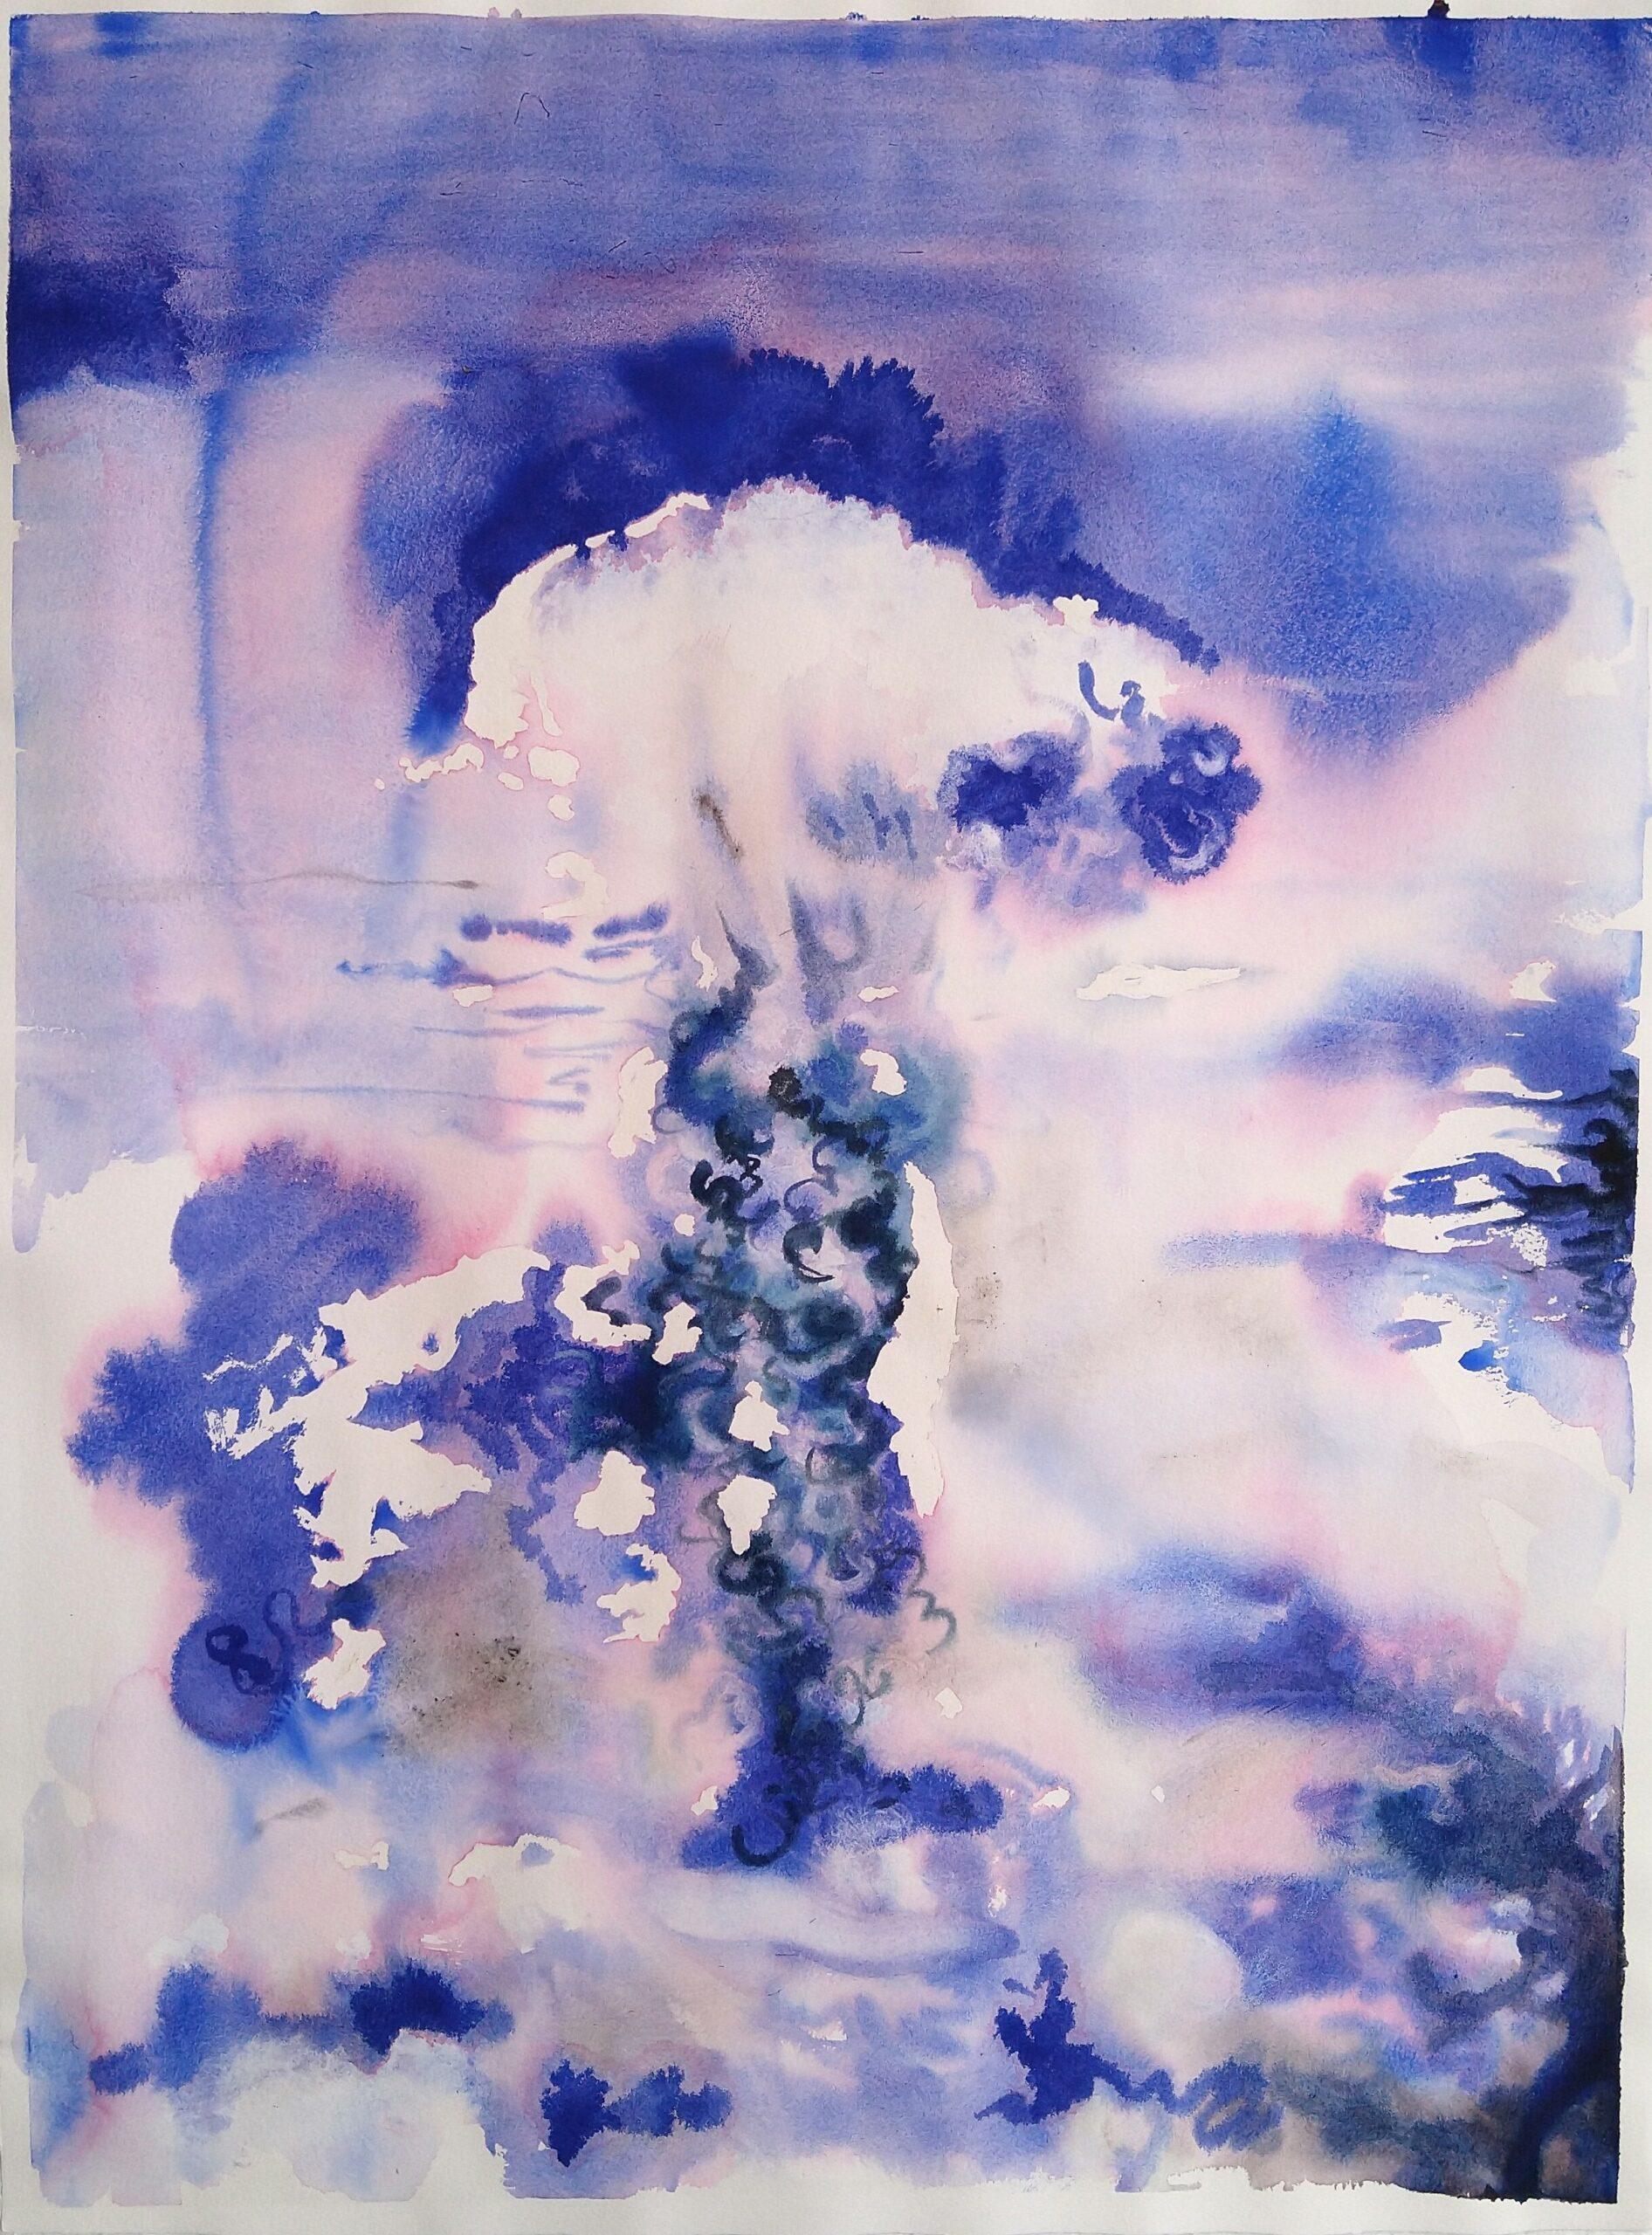 Wouter van de Koot explosion watercolour sky blue cloud elemnets fire antwerp artist